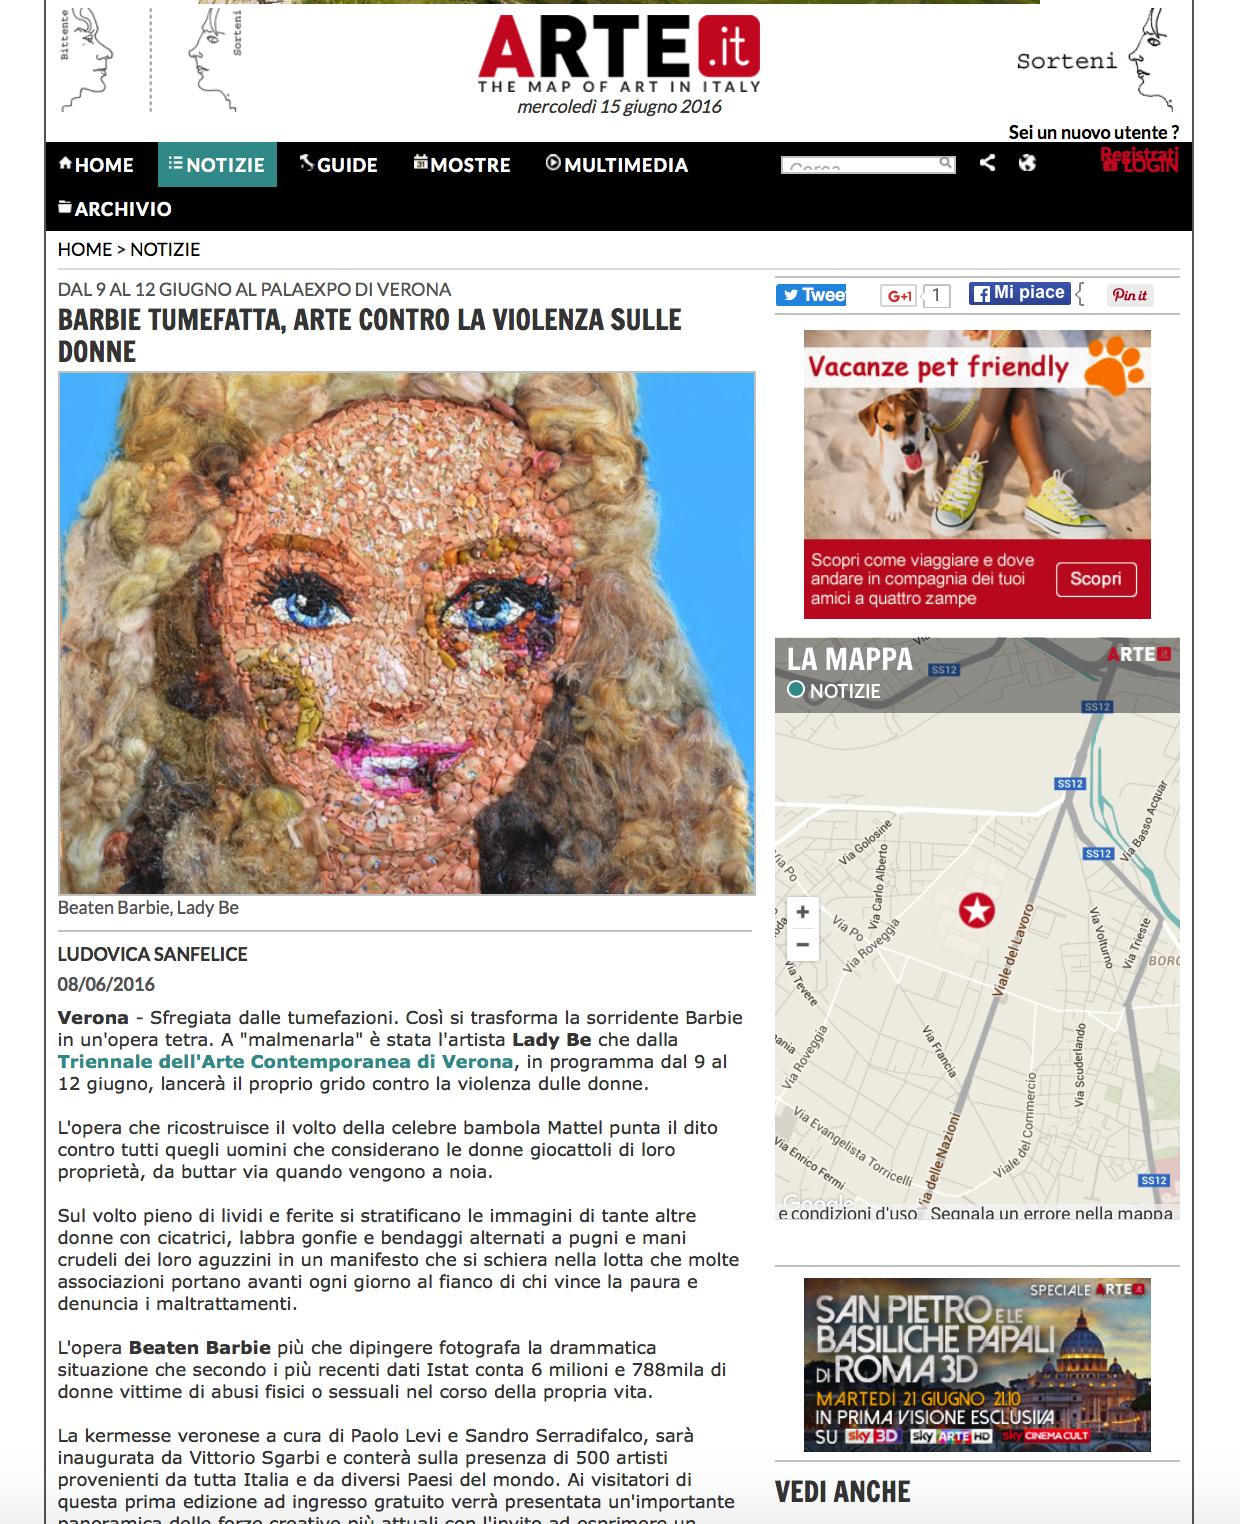 Barbie picchiata su Arte